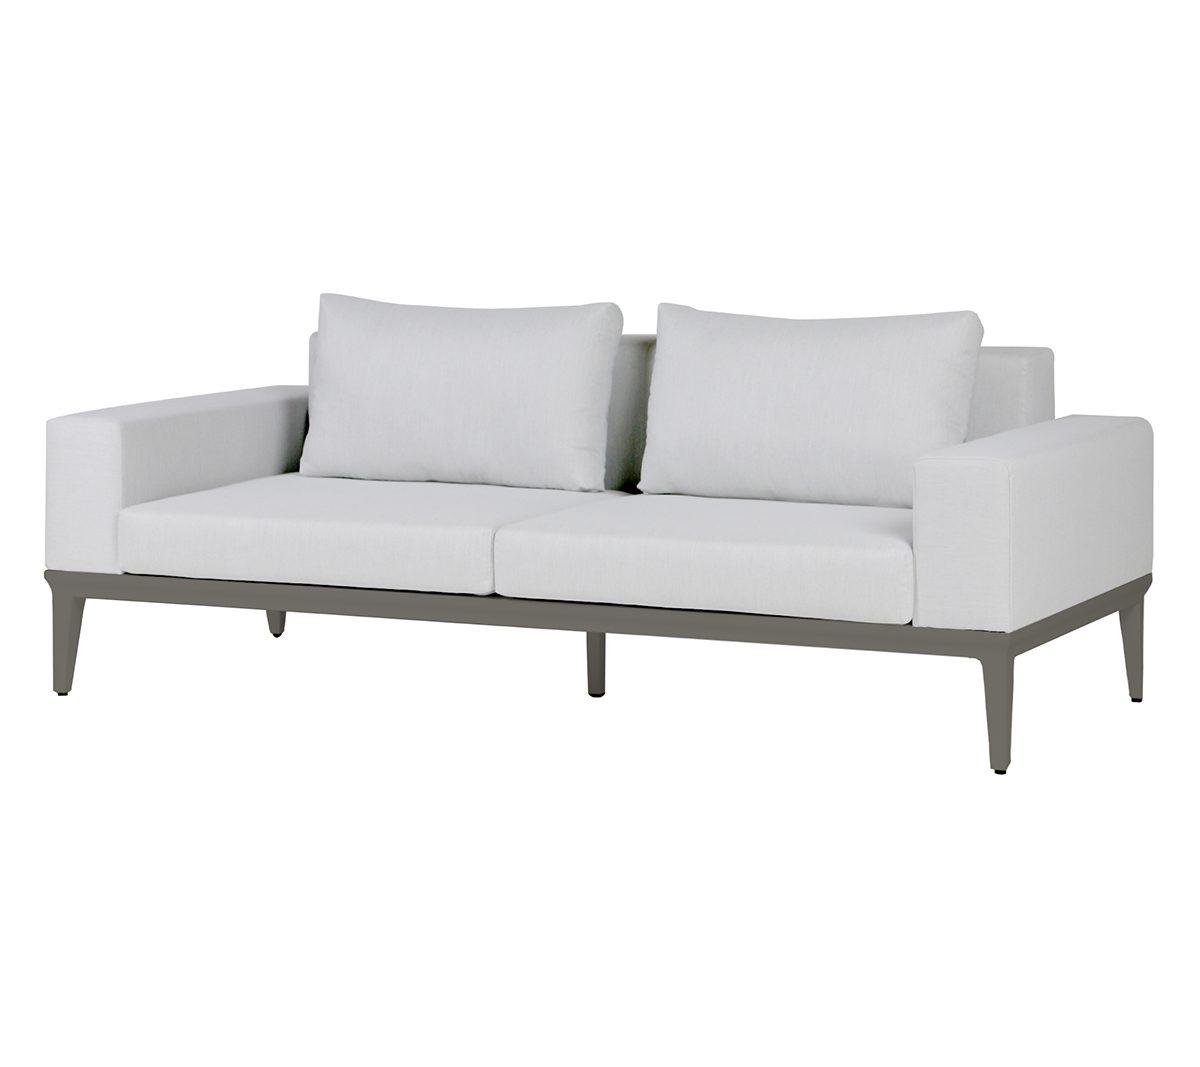 Alassio 2.5 Seater Sofa | Patio Bay